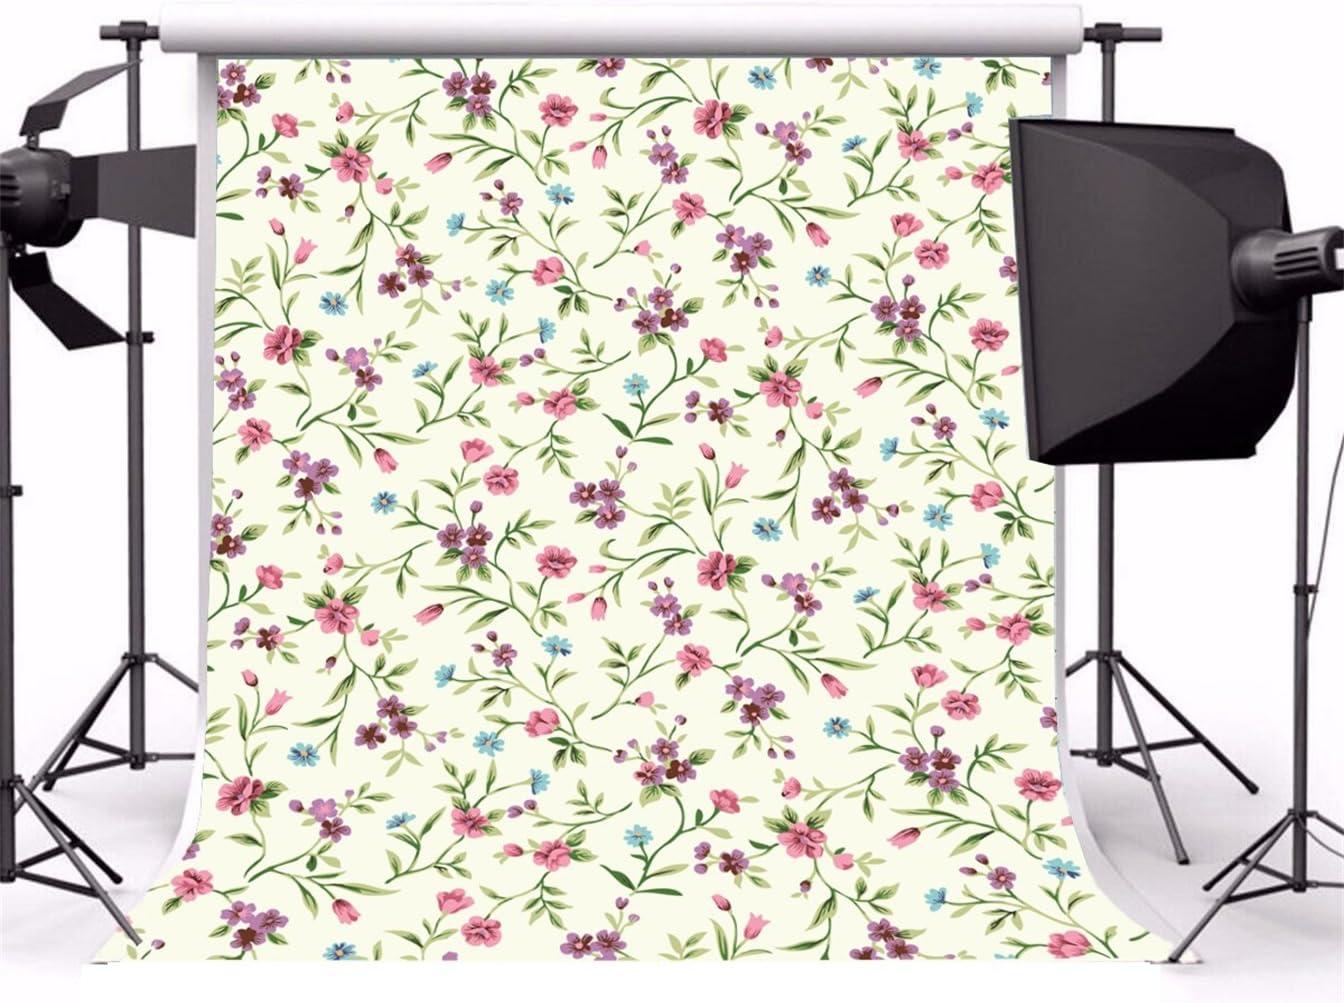 AOFOTO 10x10ft Artistic Backdrop Photography Background Plain Colour Themed Drops Sweet Flowers Cozy Florets Wallpaper Girl Portrait Seamless Photo Shoot Studio Props Video